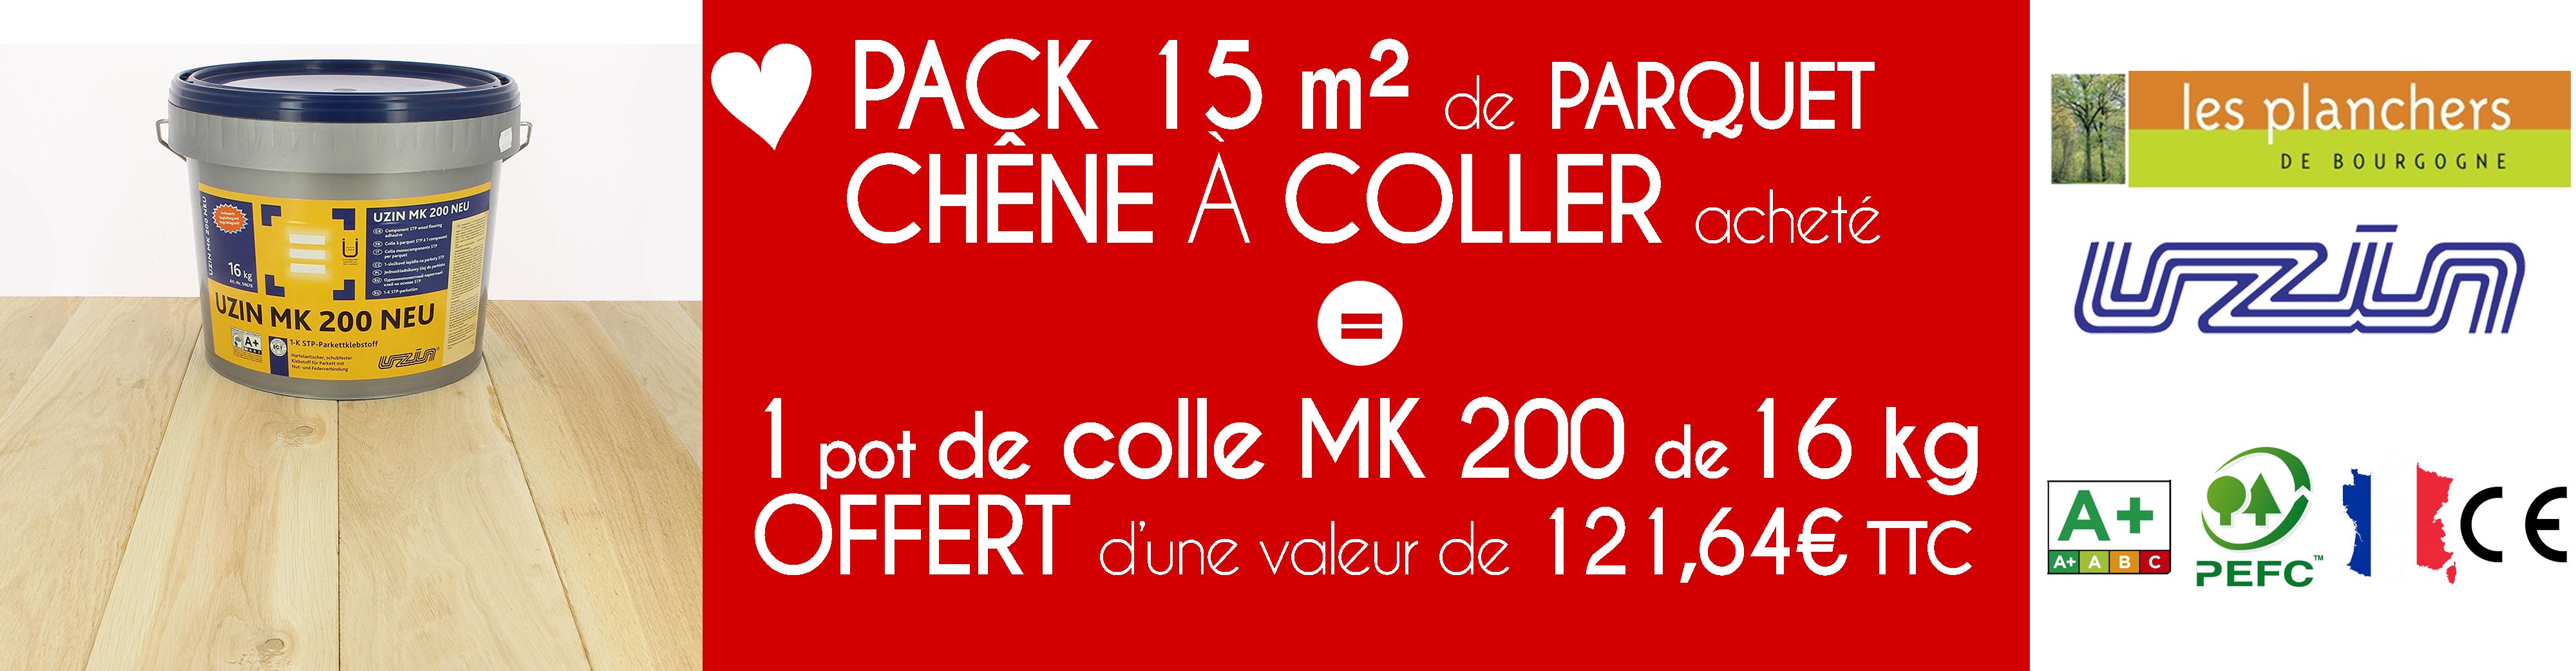 https://www.kenzai.fr/parquet-naturel-a-coller-bois/2766-pack-parquet-en-chene-massif-brut-a-coller-colle-mk-200.html